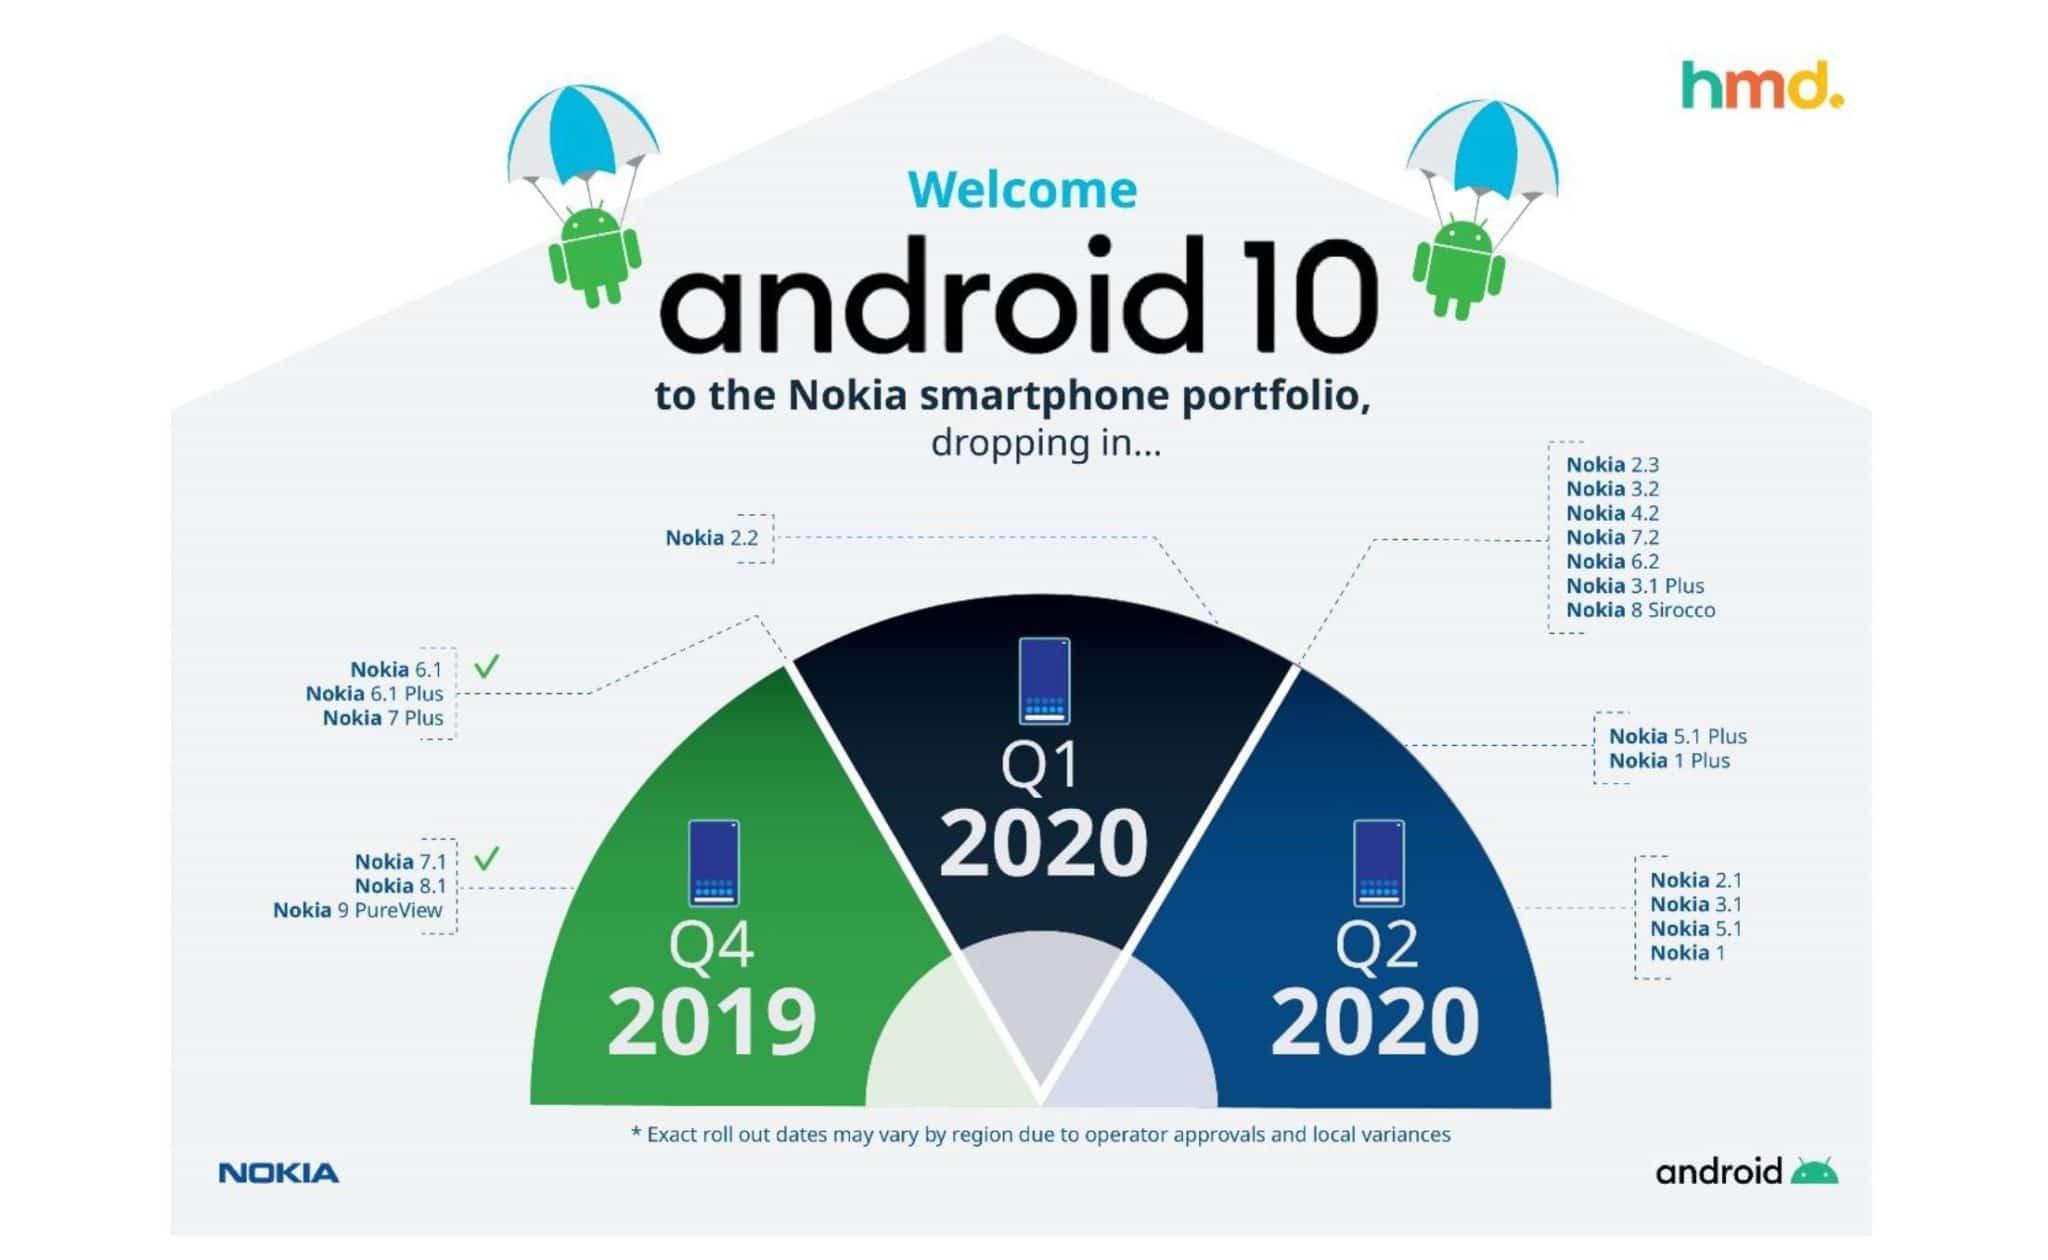 Nokia Android 10 Updateplan